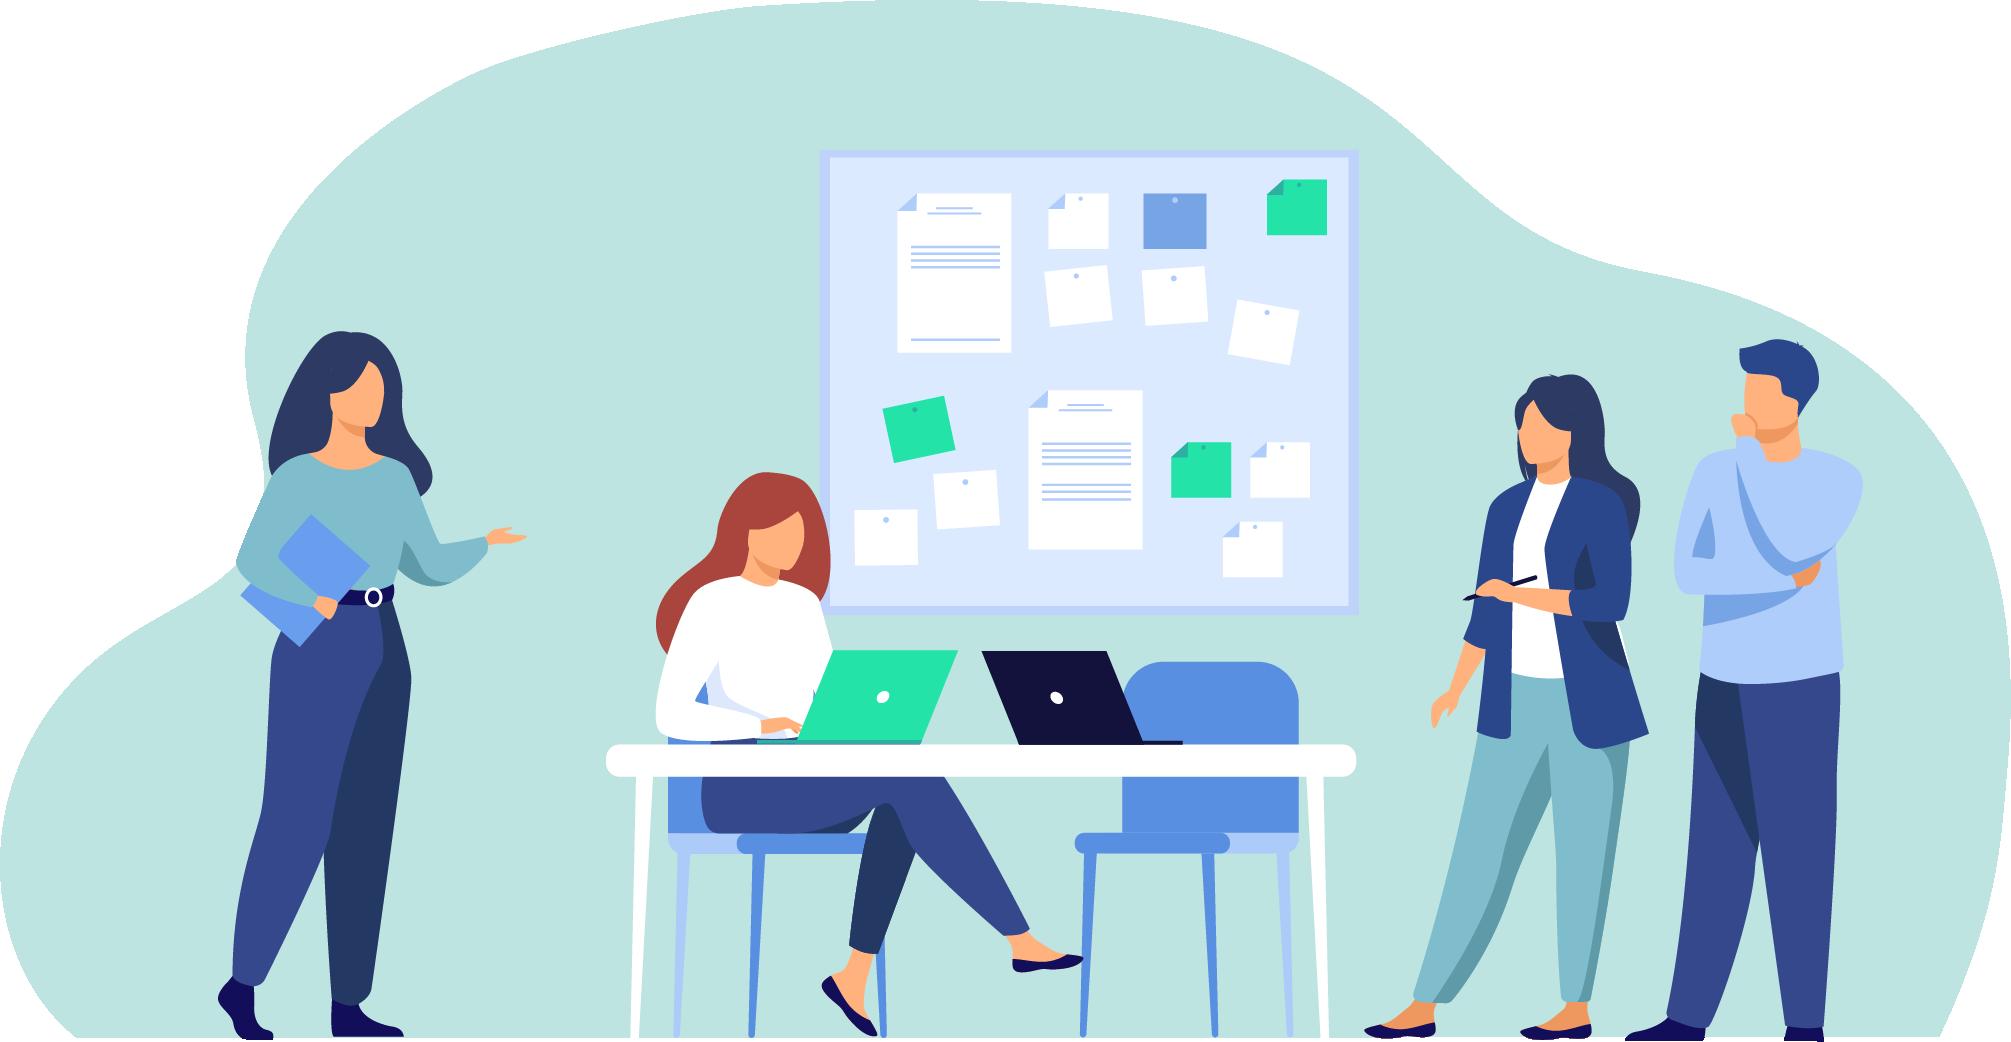 Organiser réunions